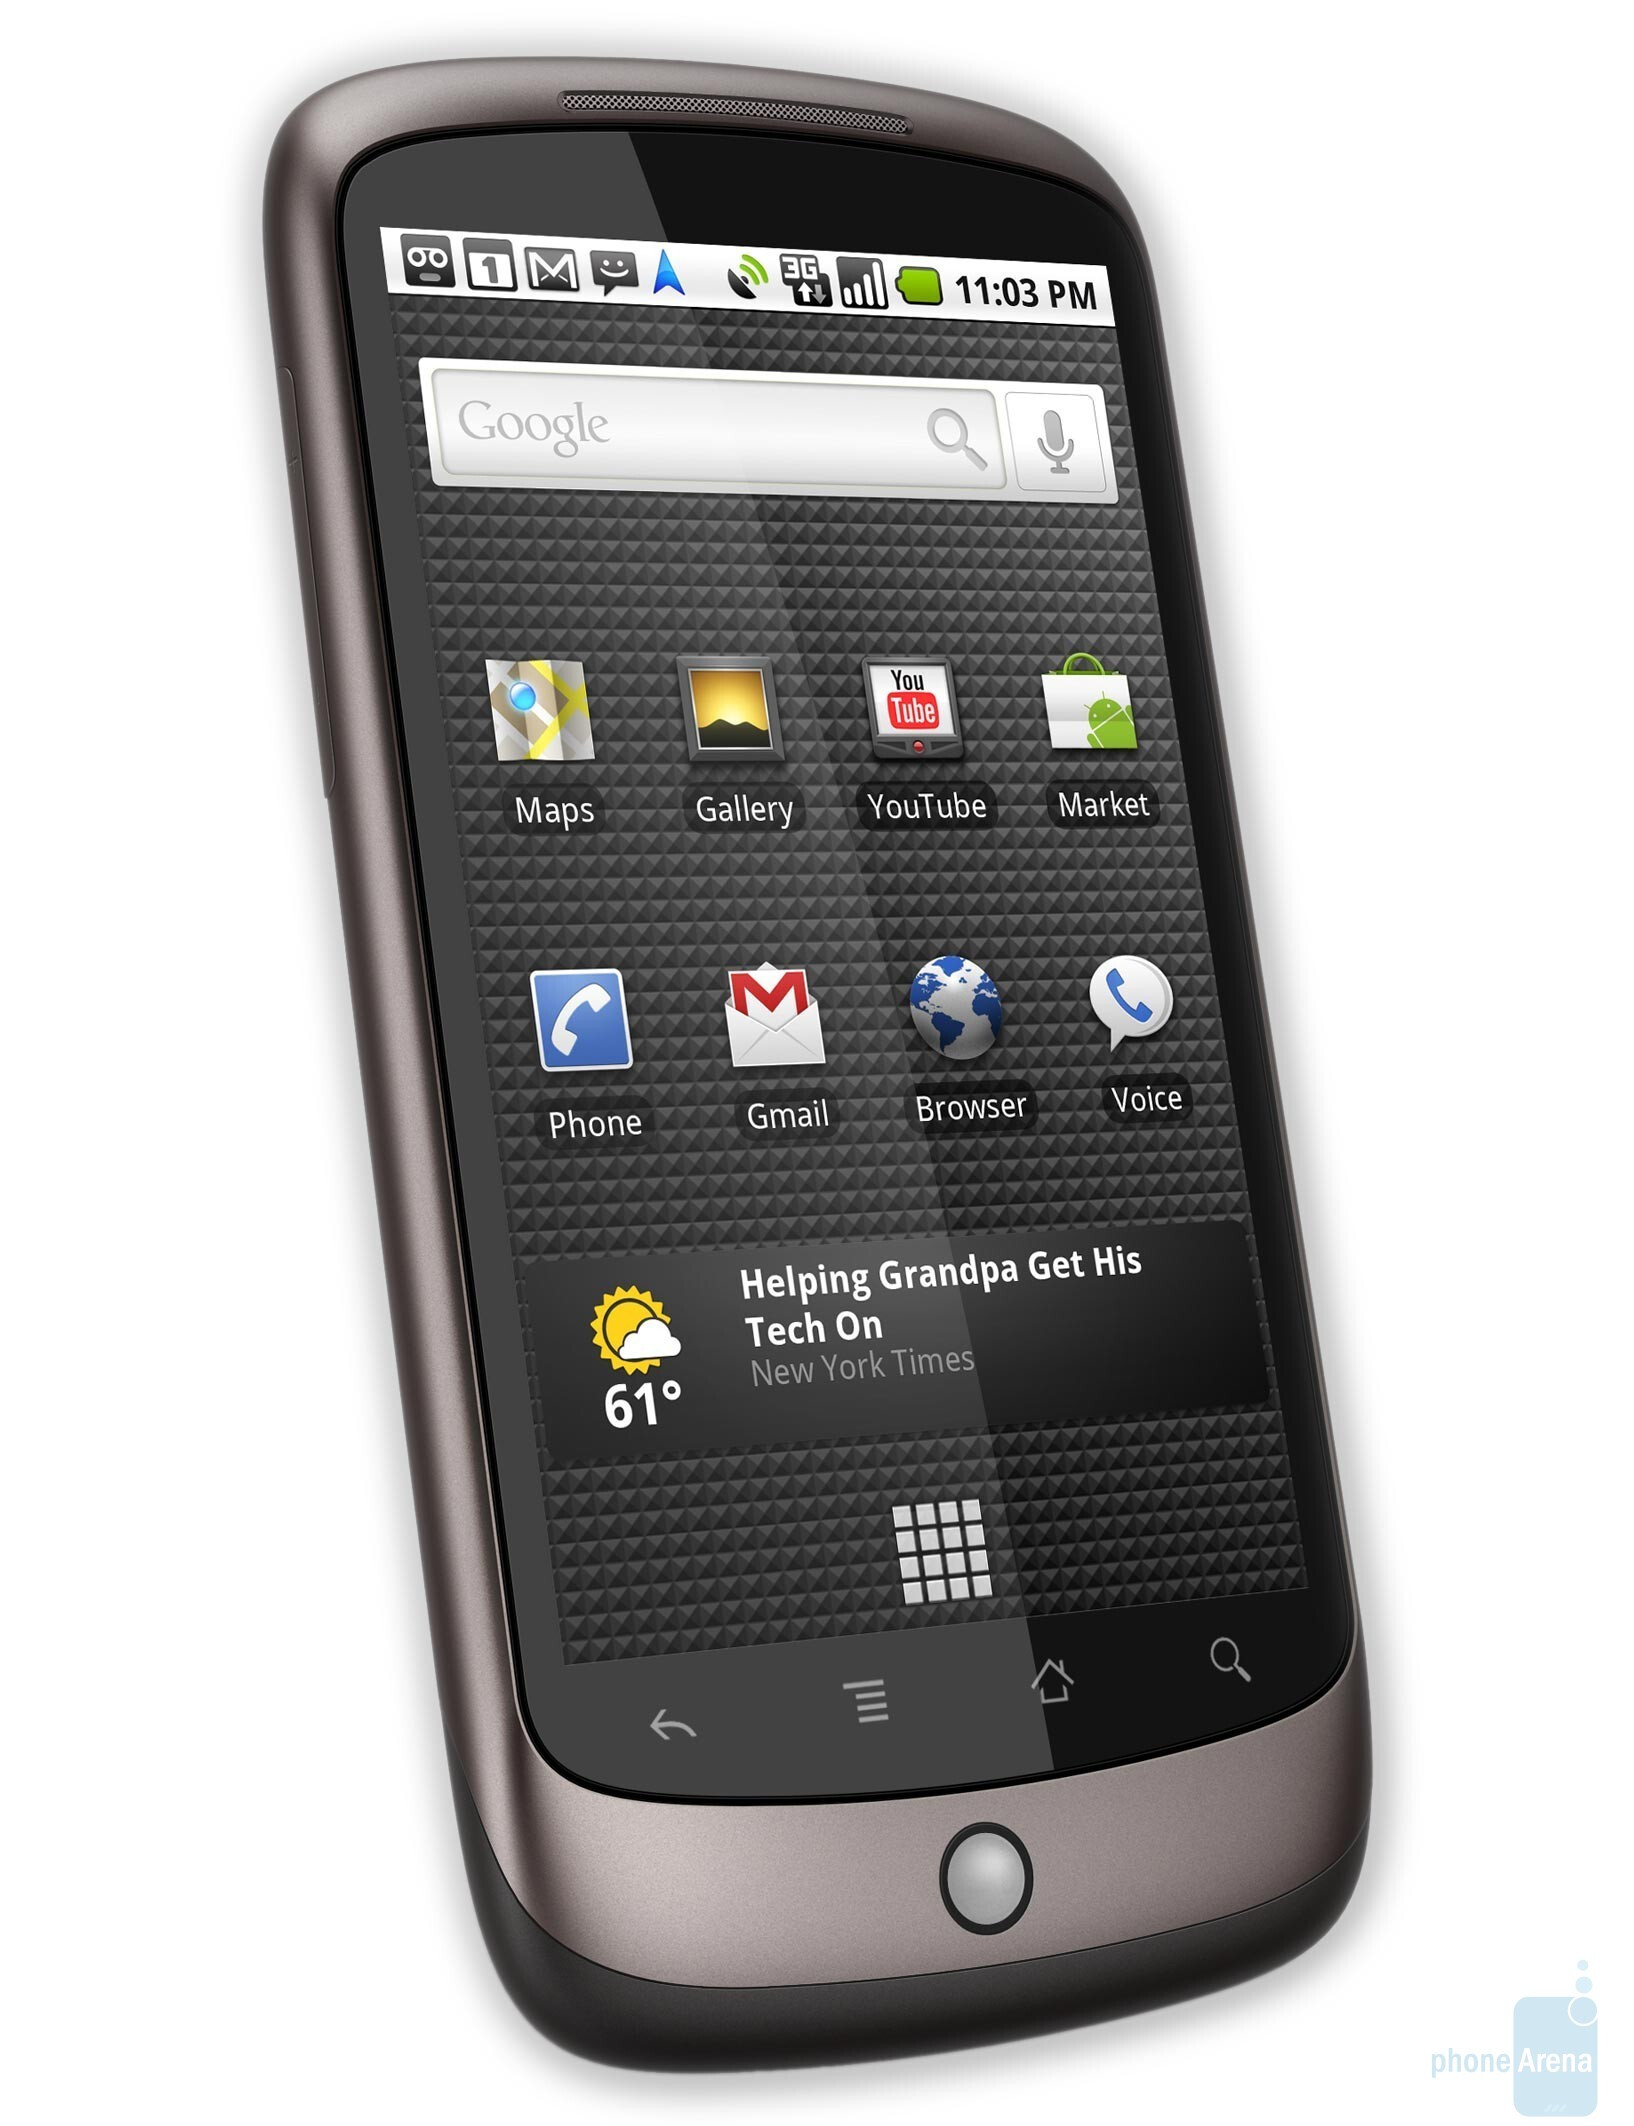 Should I choose the HTC EVO 4G or the Google Nexus One?